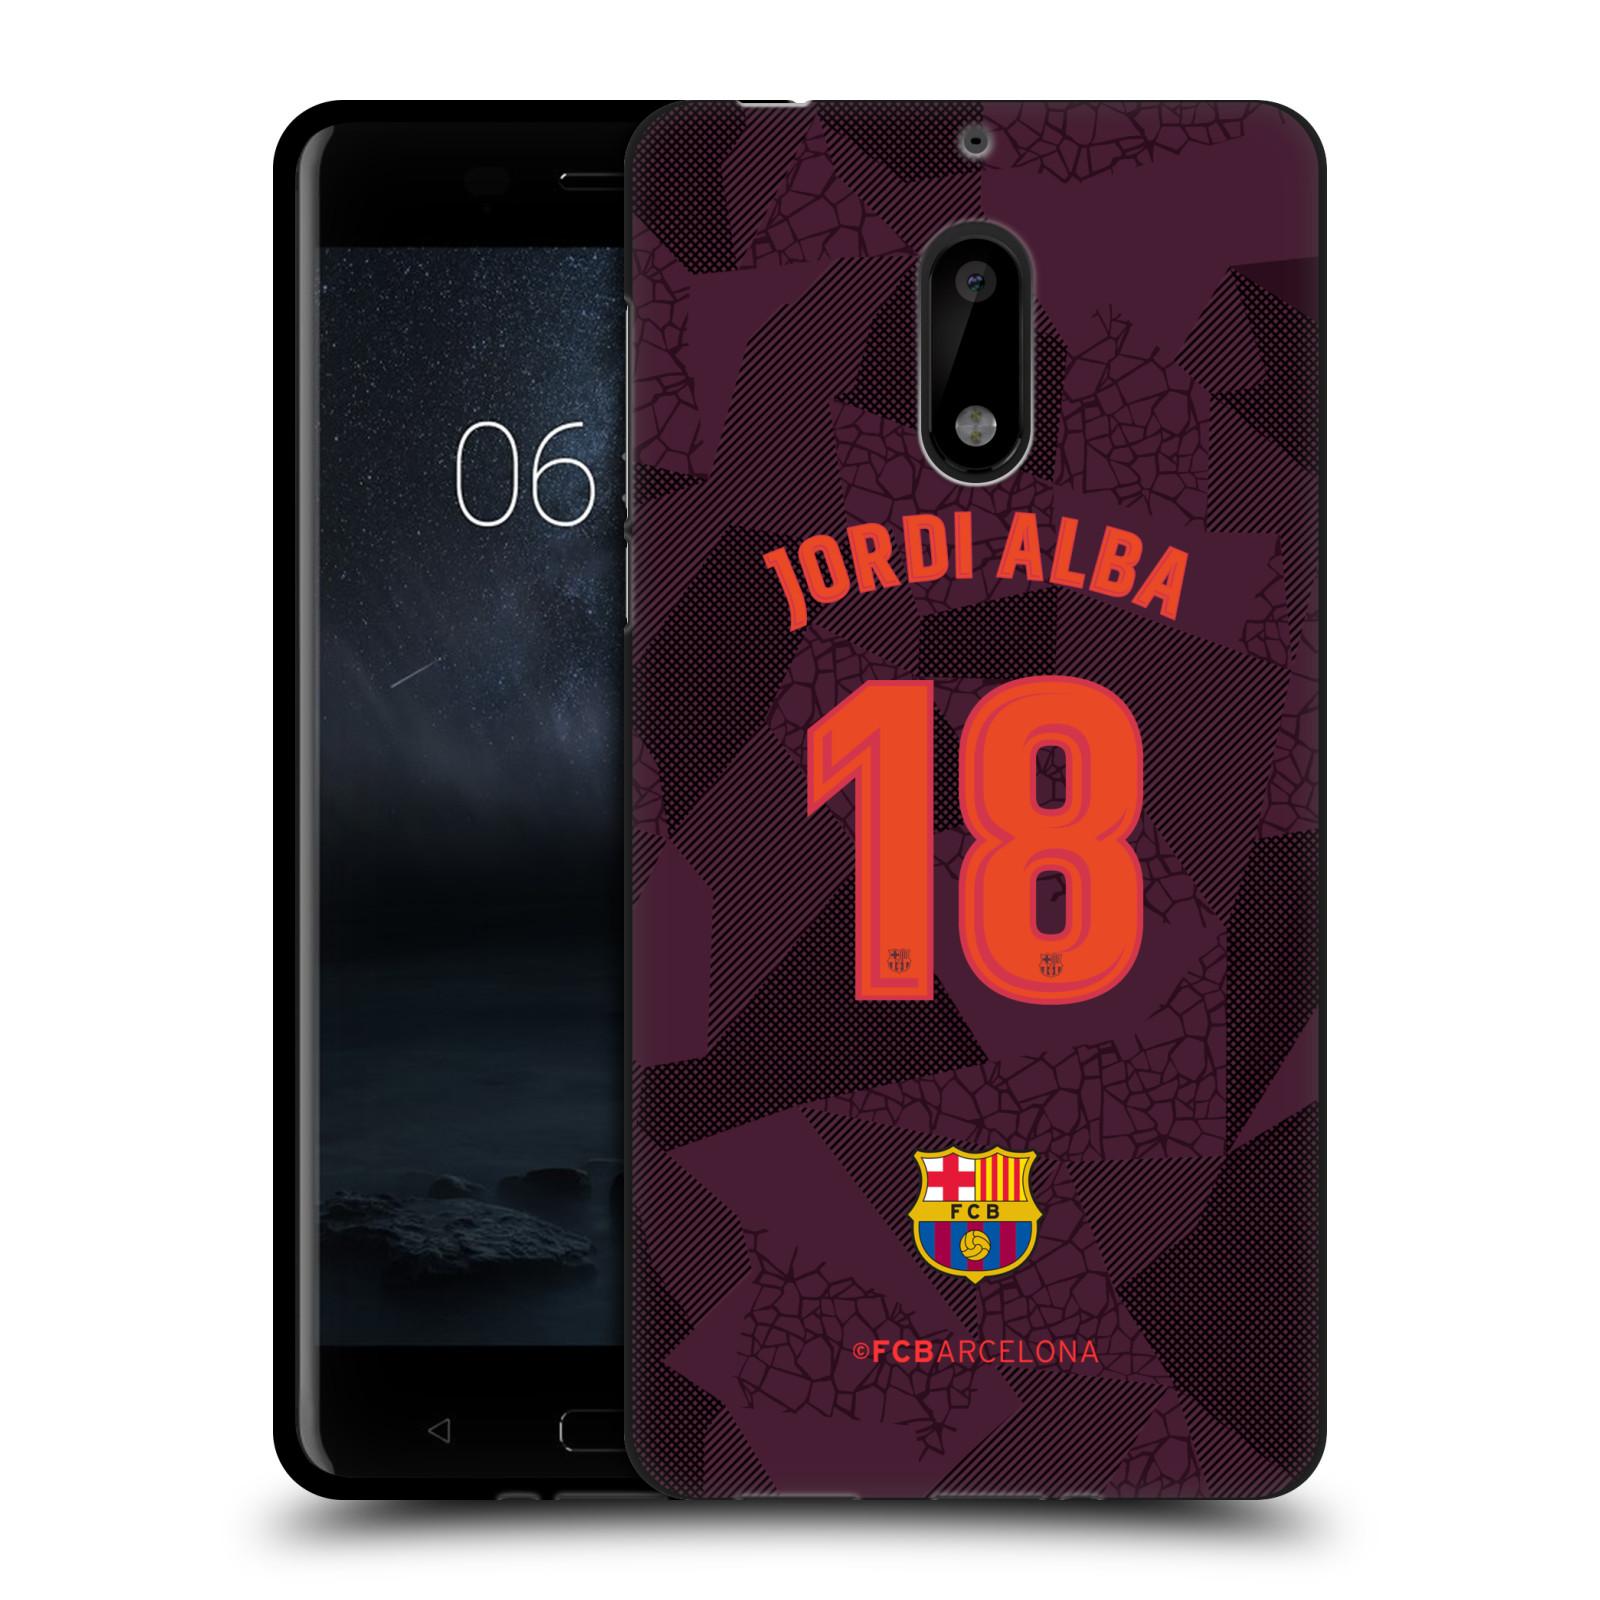 FC-BARCELONA-2017-18-THIRD-KIT-1-BLACK-SOFT-GEL-CASE-FOR-MICROSOFT-NOKIA-PHONES